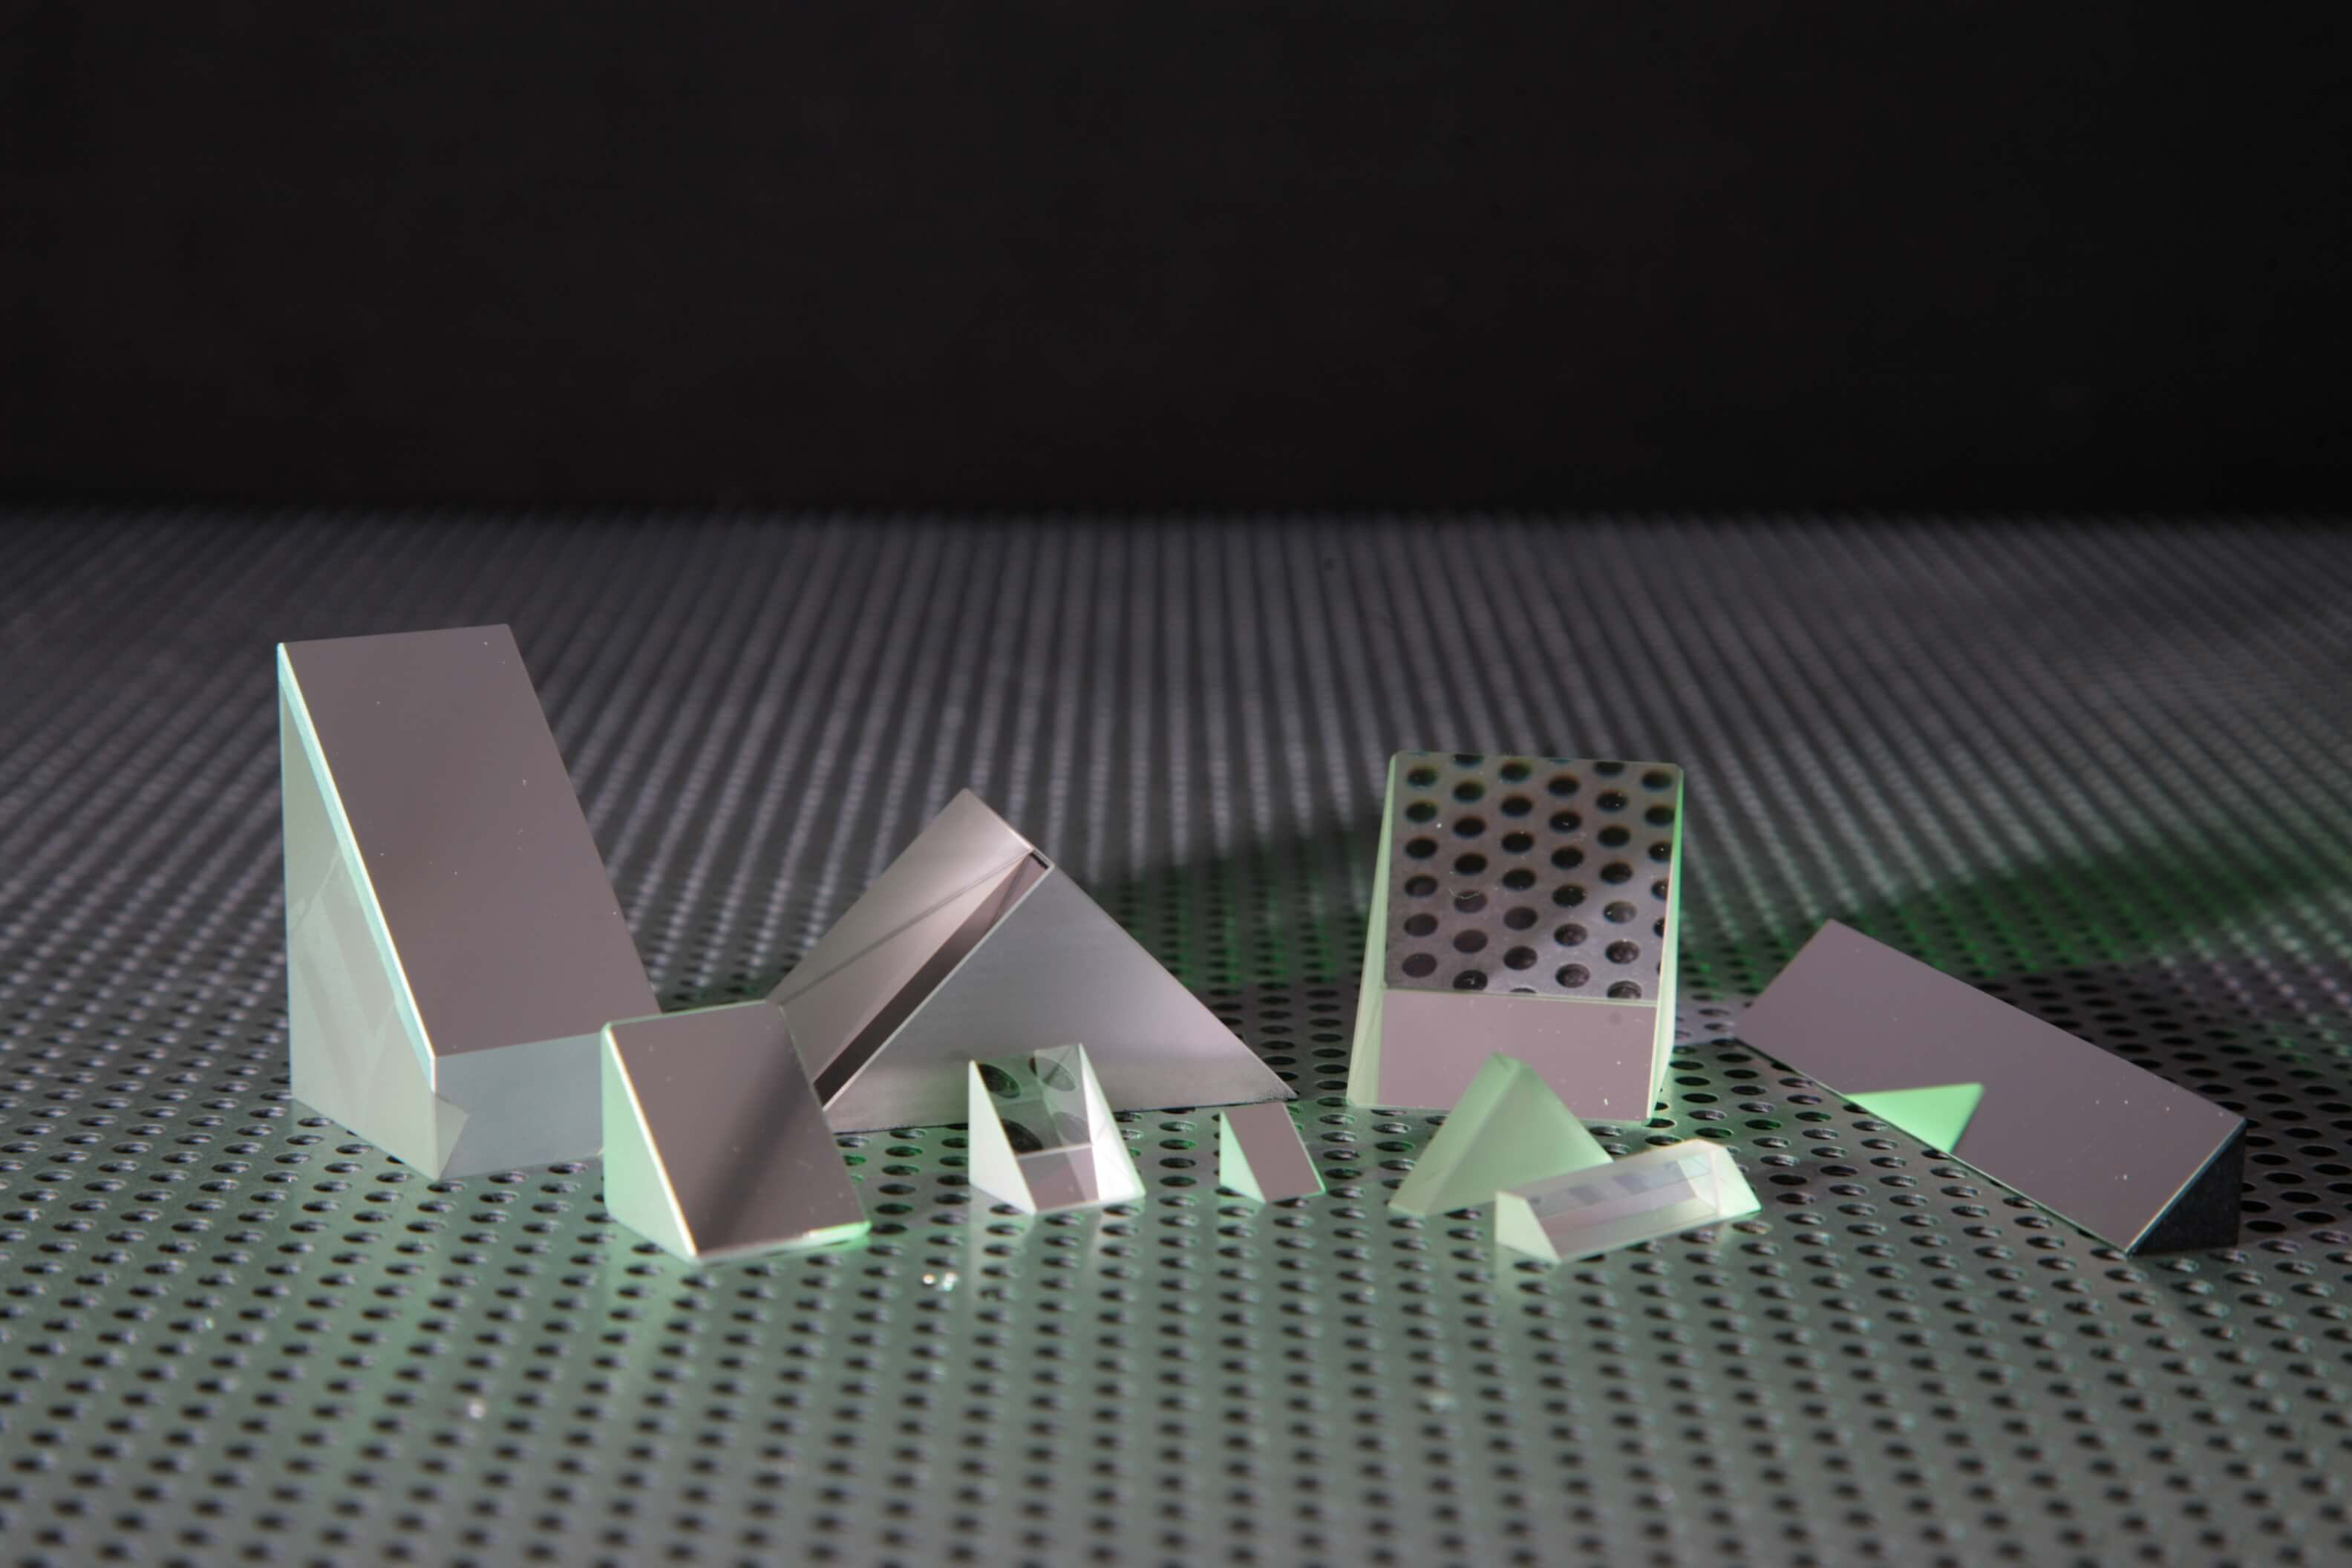 Custom Right Angle Prisms